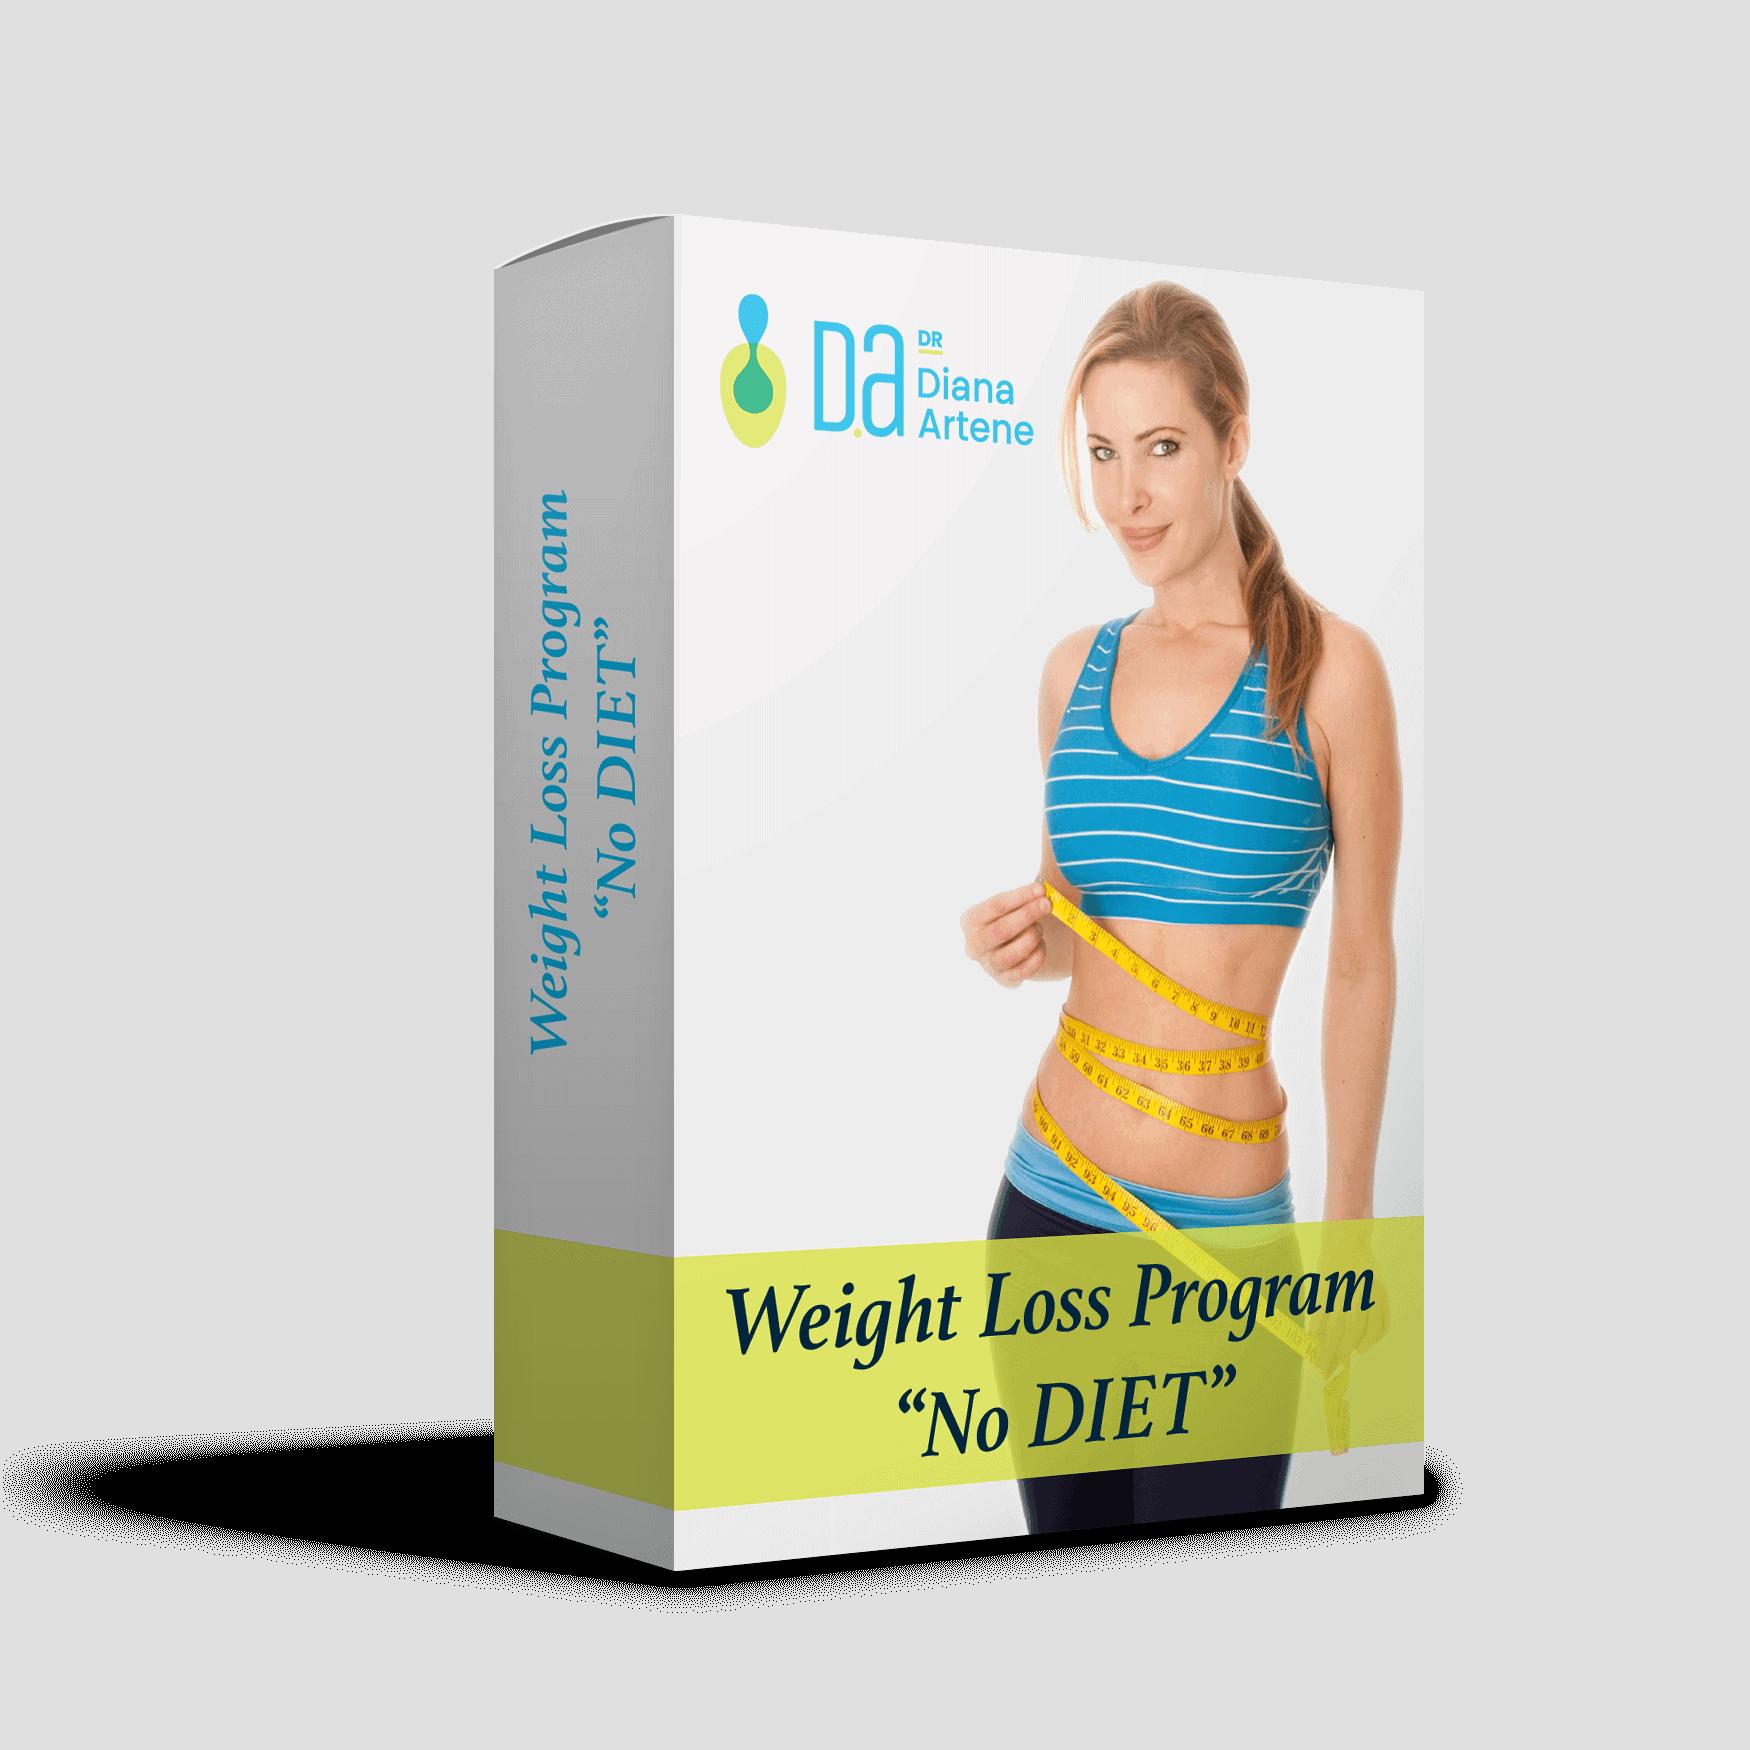 No Diet Weight Loss Program Nutrition Services Nutritionist Dr Diana Artene